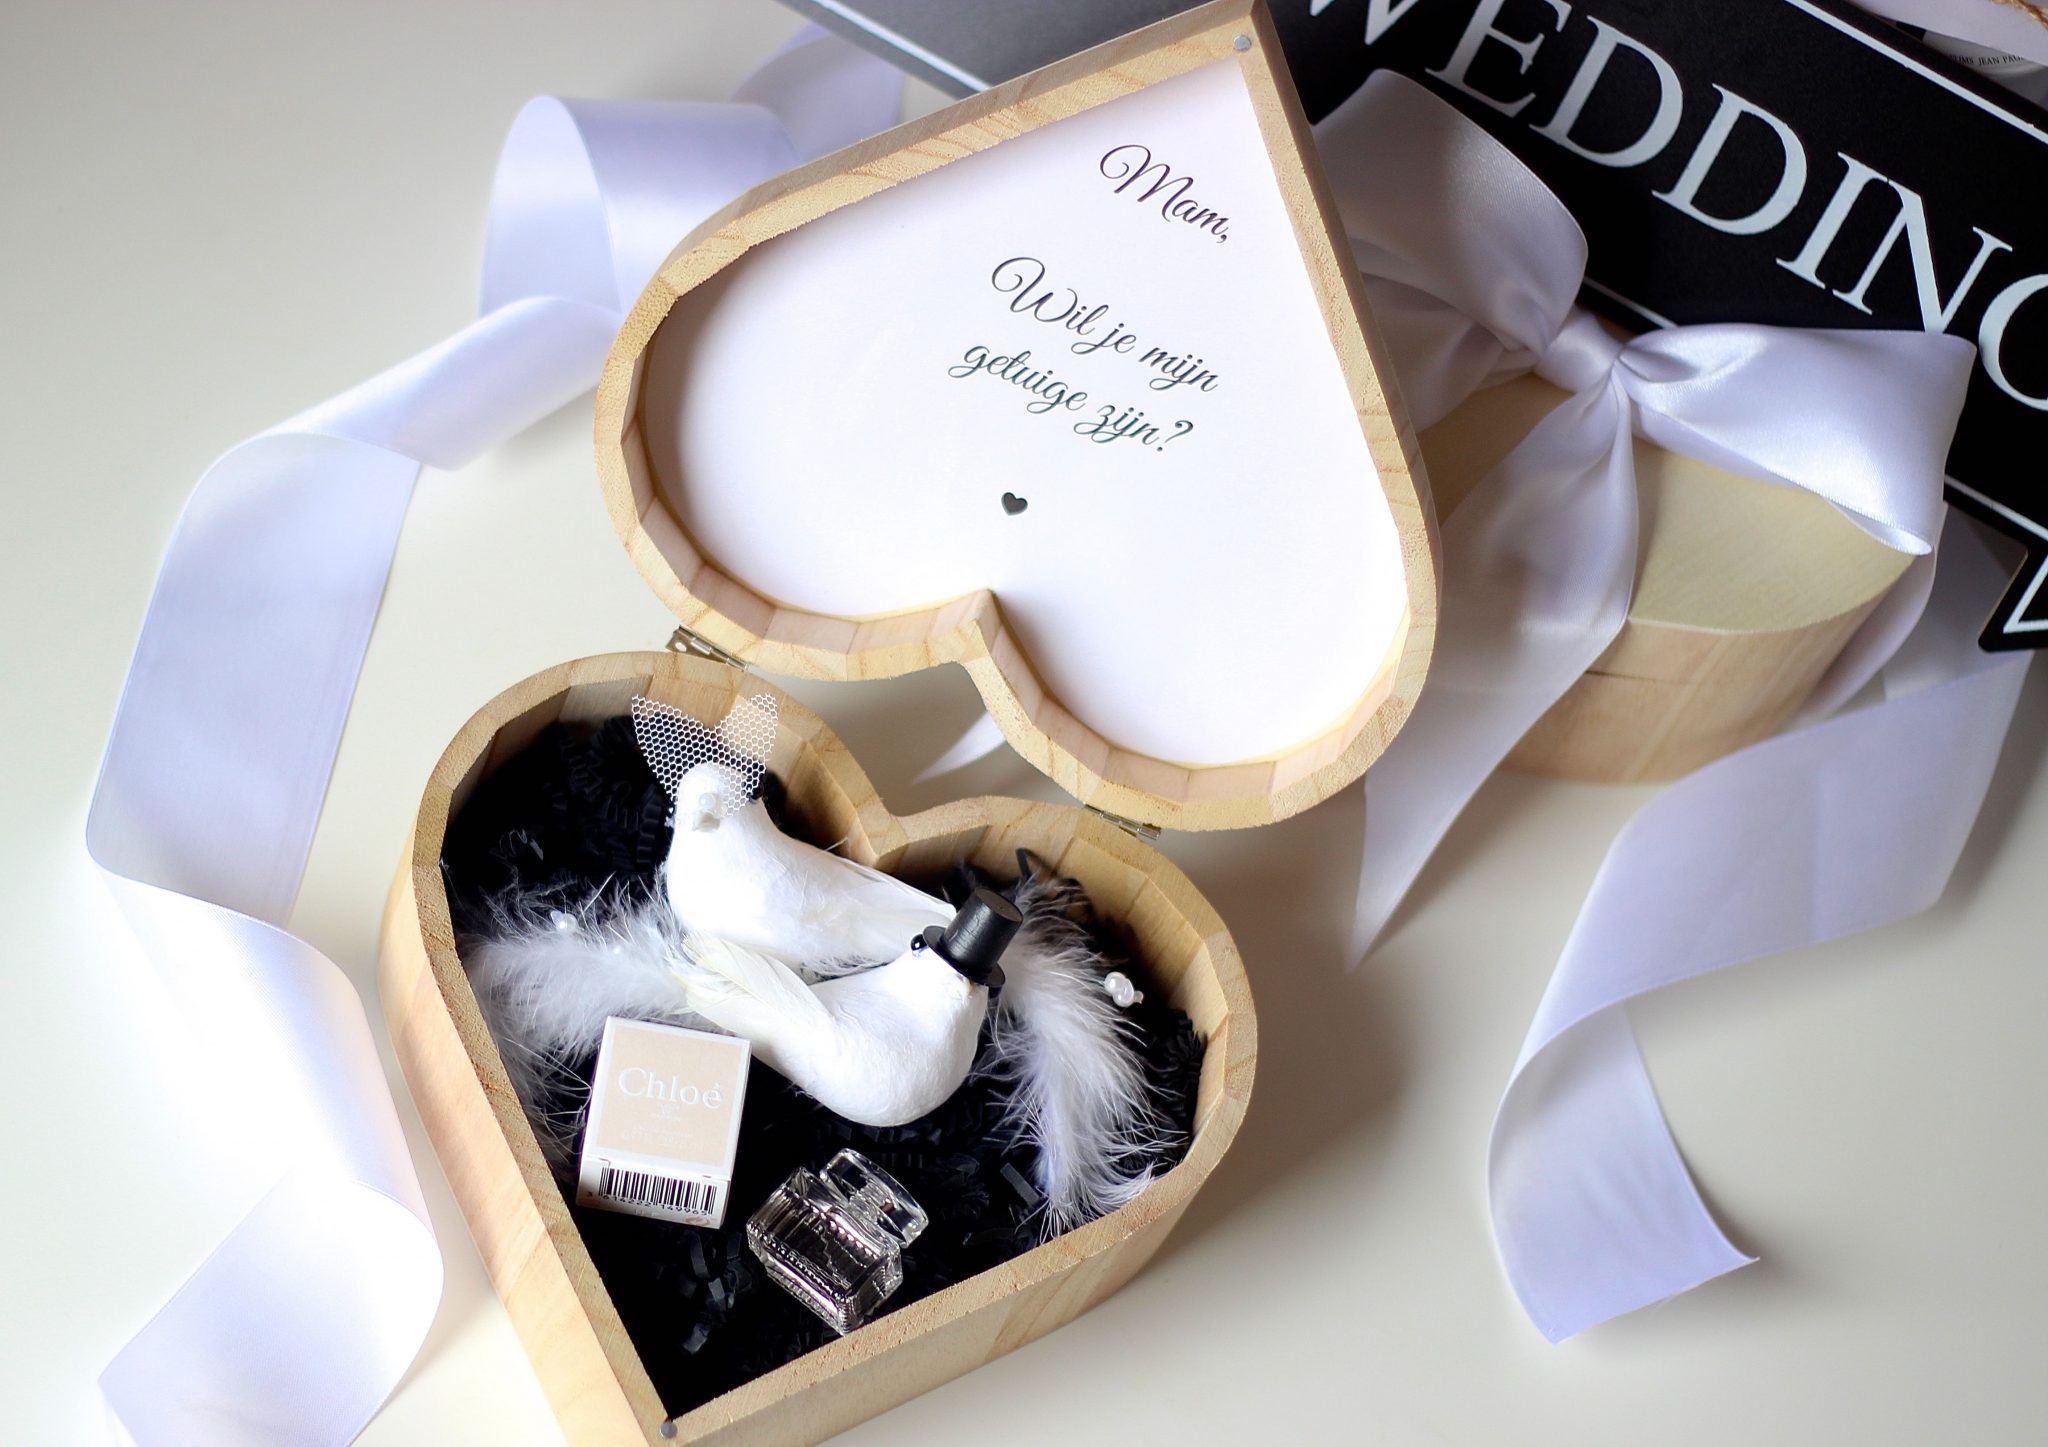 Getuigen vragen bruiloft cadeau